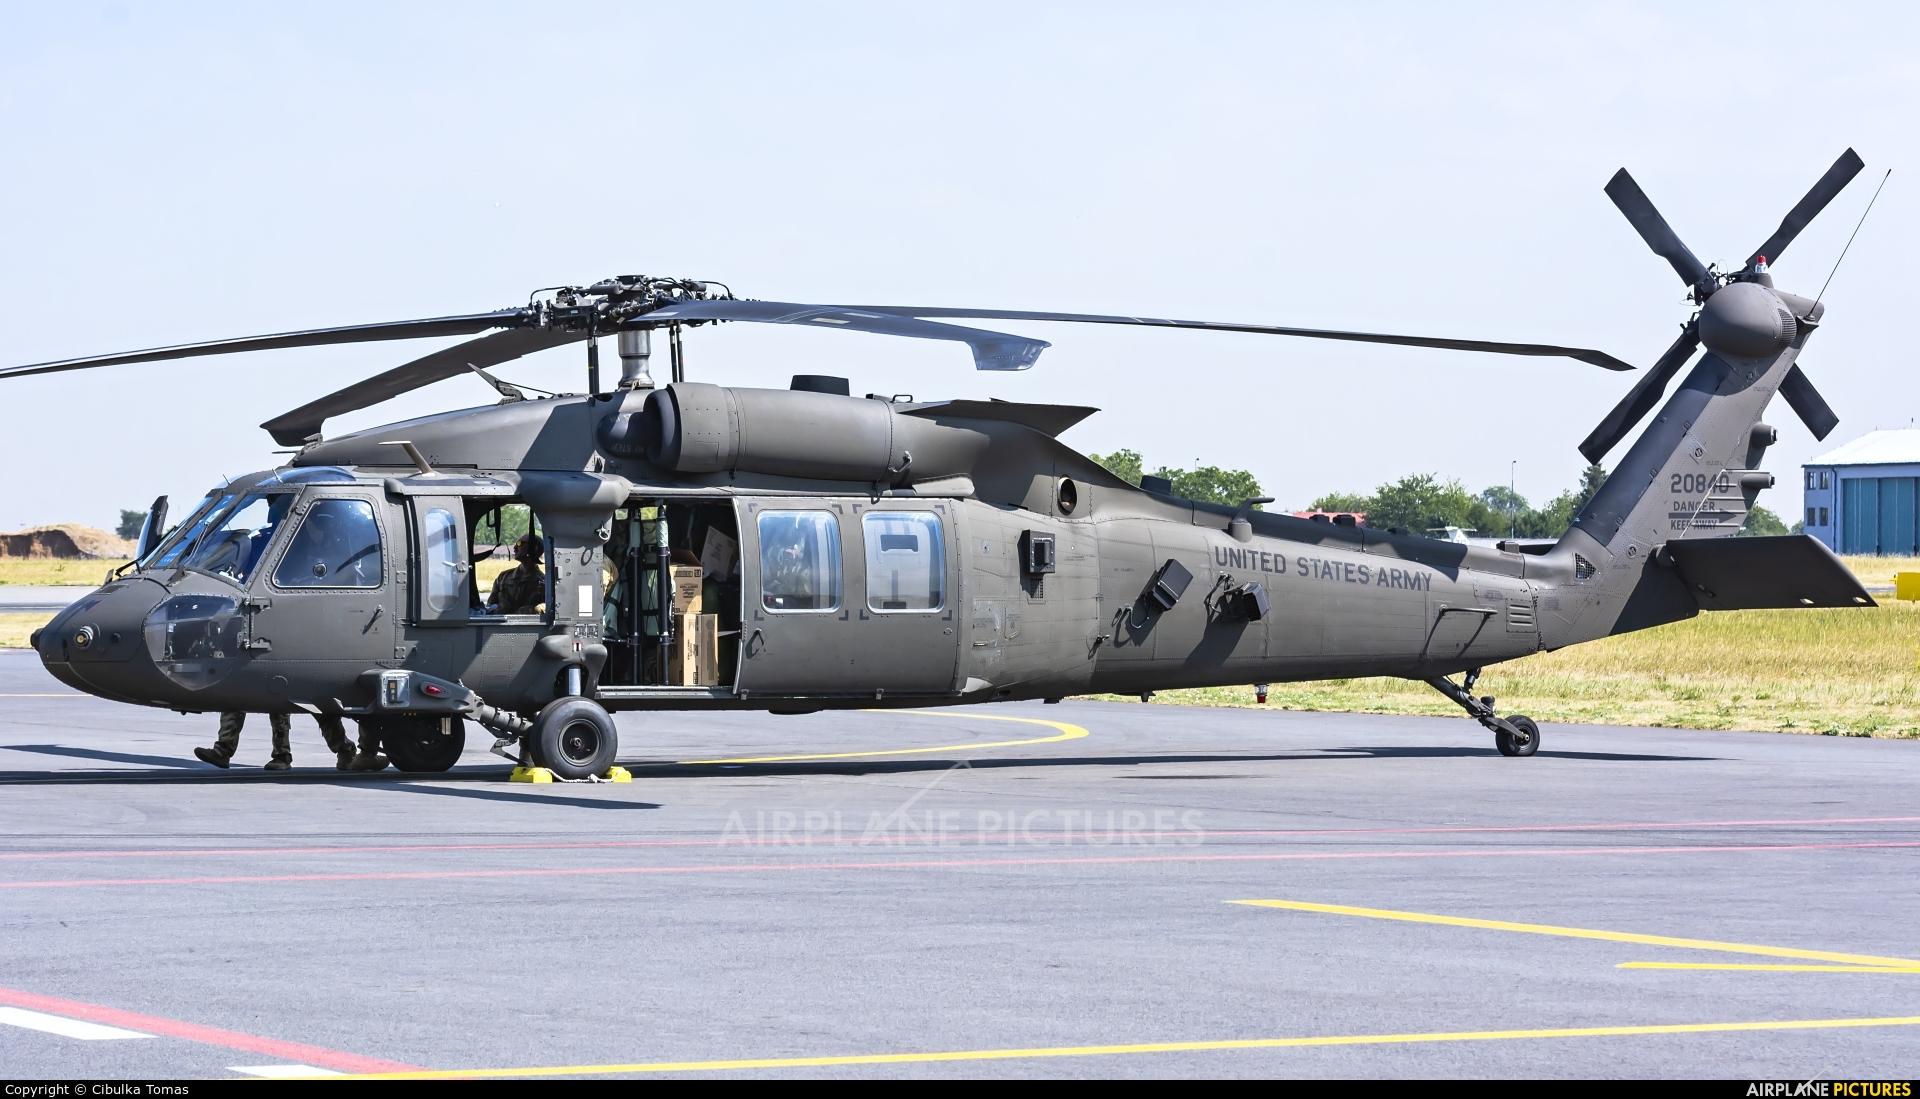 USA - Army 16-20840 aircraft at Prague - Václav Havel